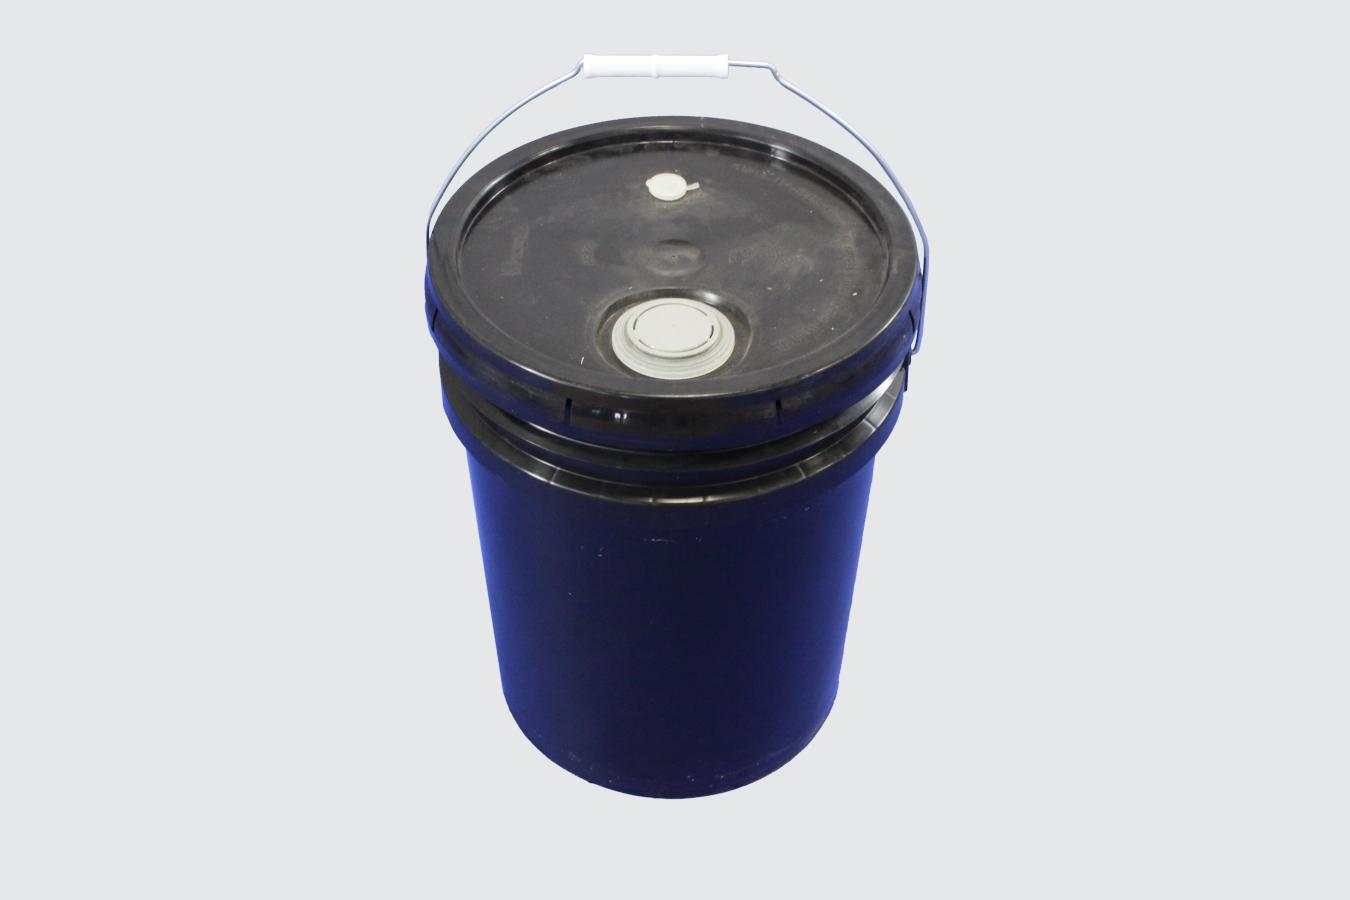 22252126-COMPRESSOR FLUID, XHP405 5 GAL BUCKET